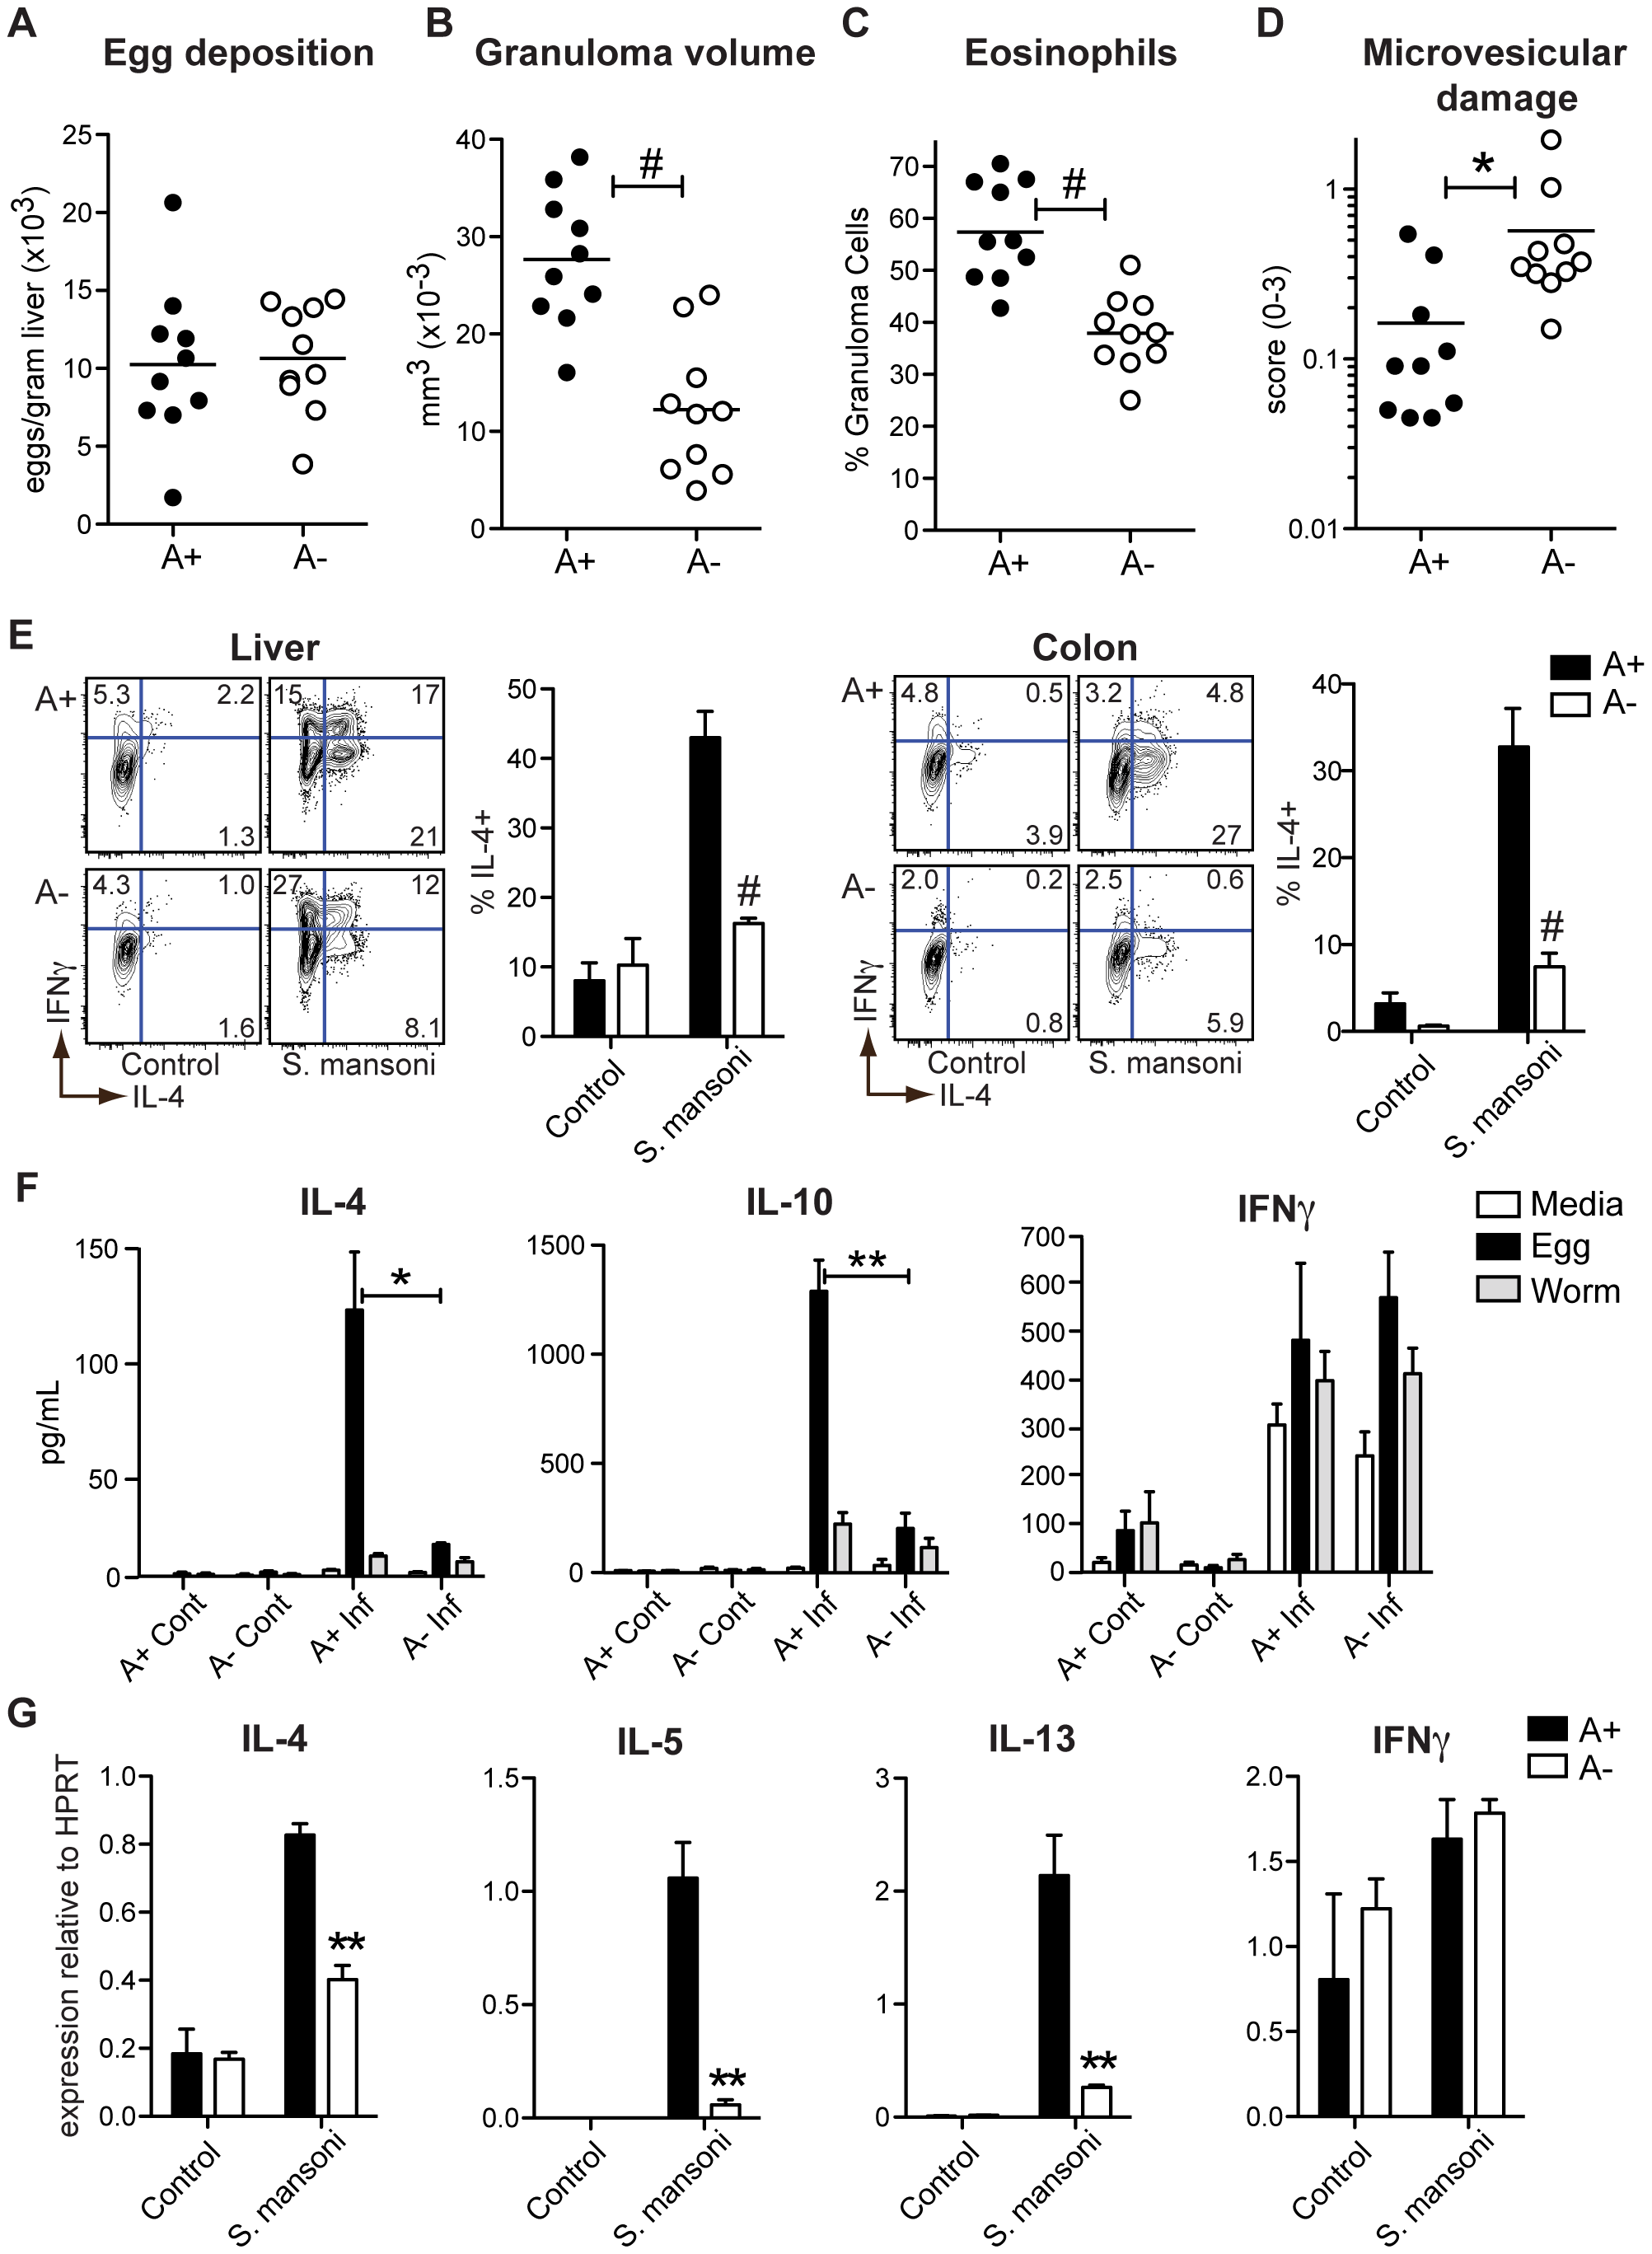 Vitamin A deficiency impairs <i>S. mansoni</i>-elicited Th2 responses.